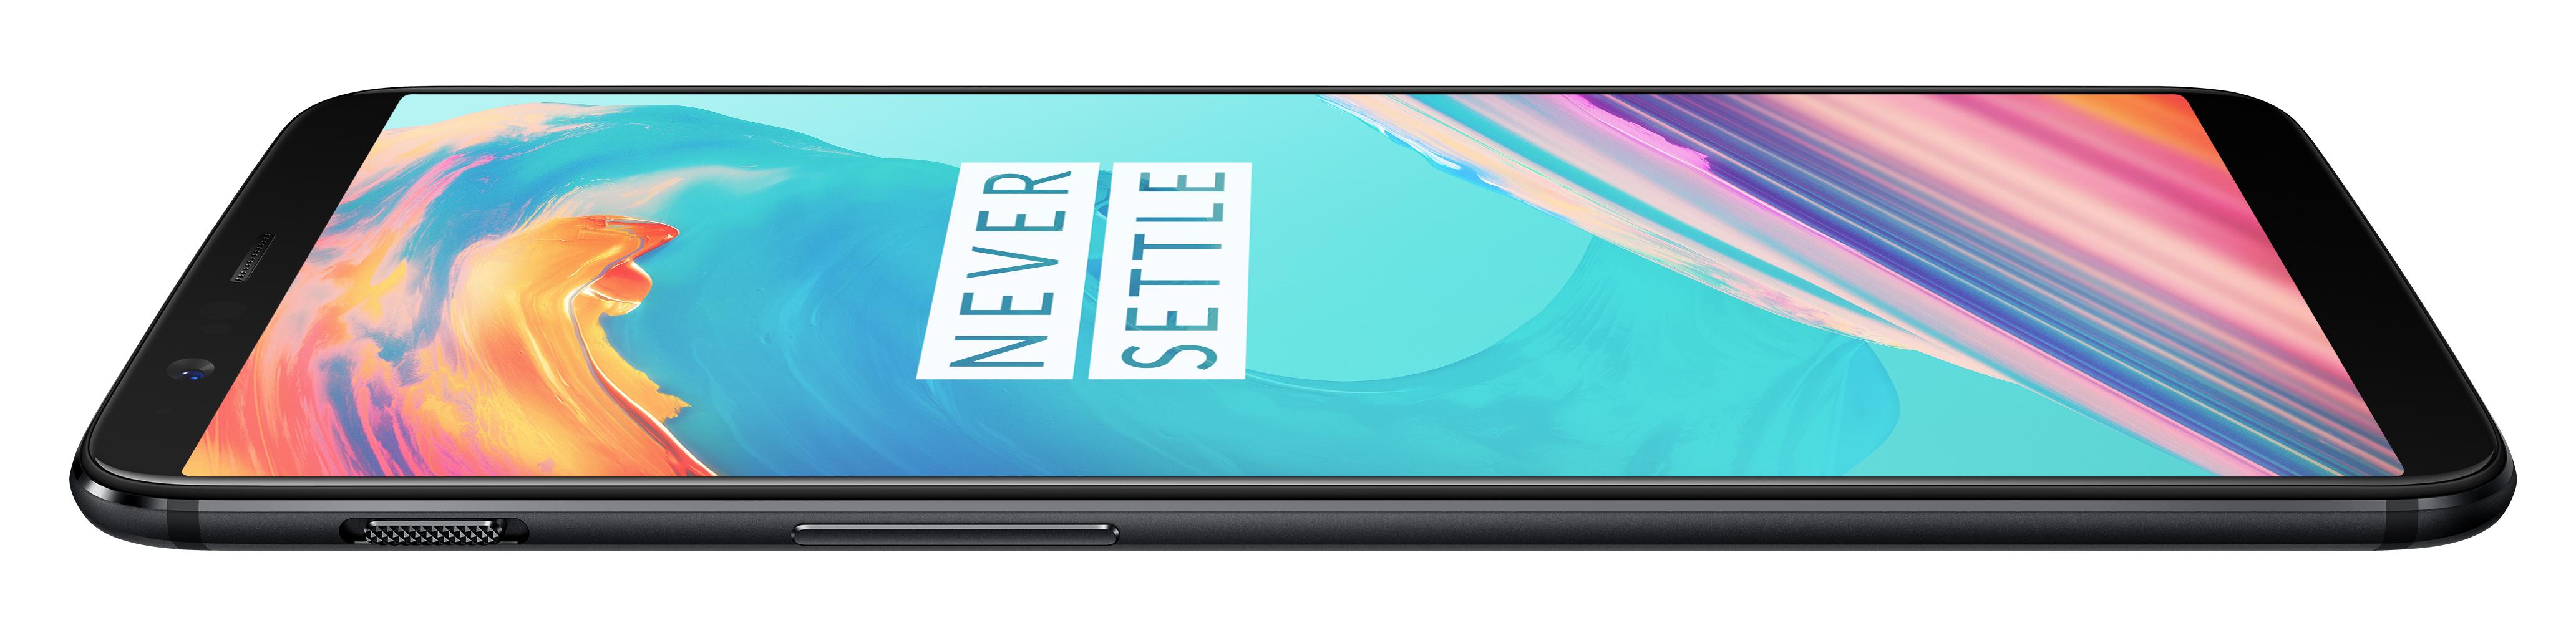 OnePlus 5T.